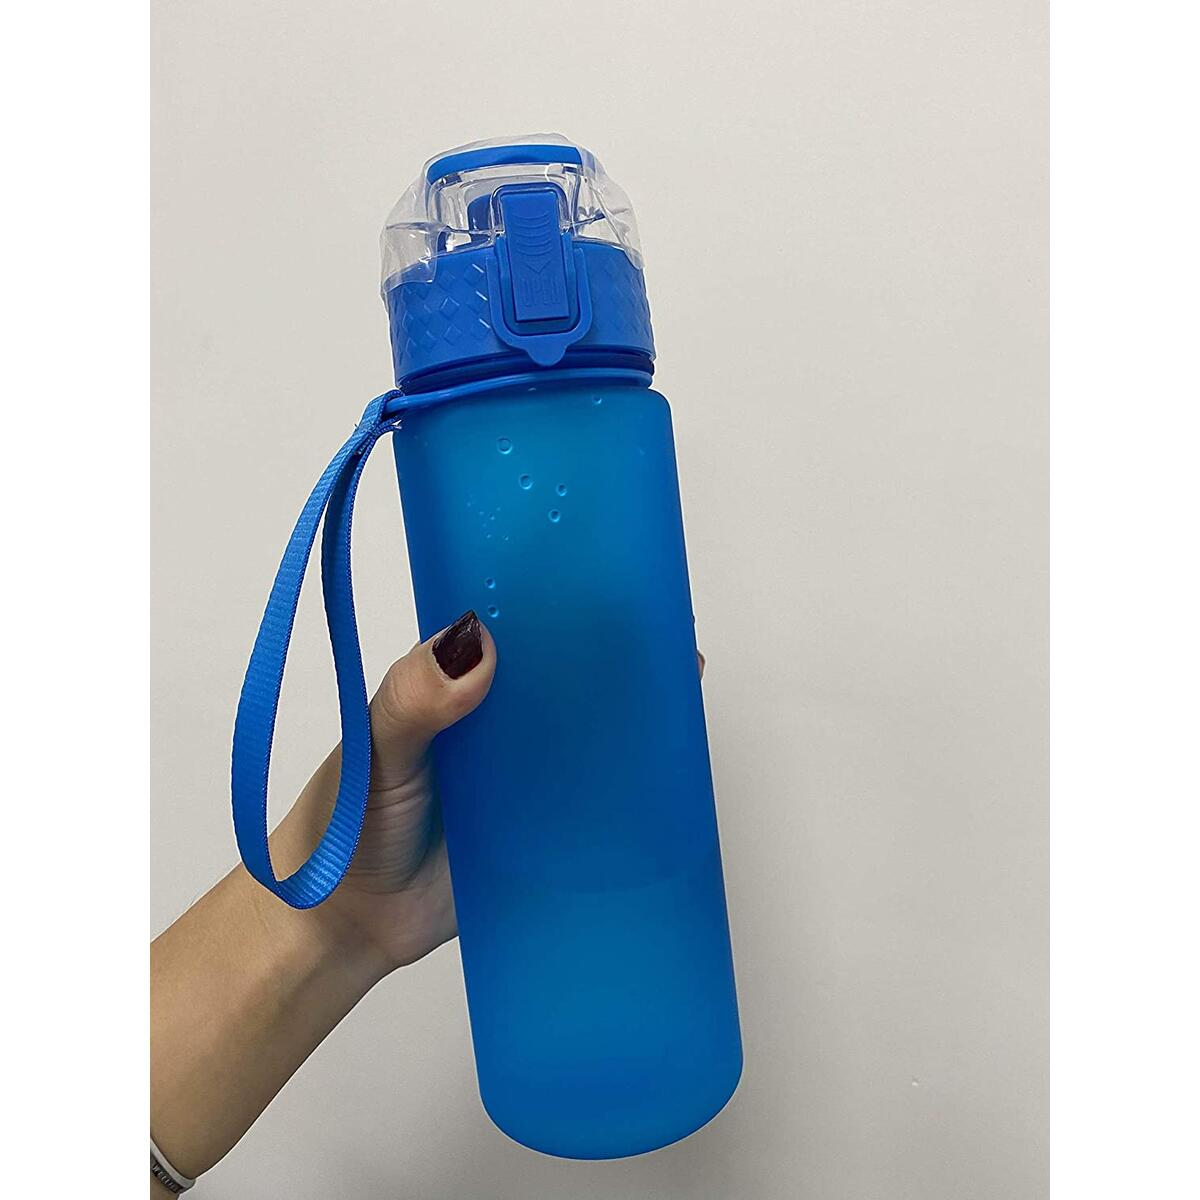 Wichmann | Motivational water bottle leak proof 740ml bottle high performance | daily useable for drinking purpose 32 oz water bottle.(Blue)